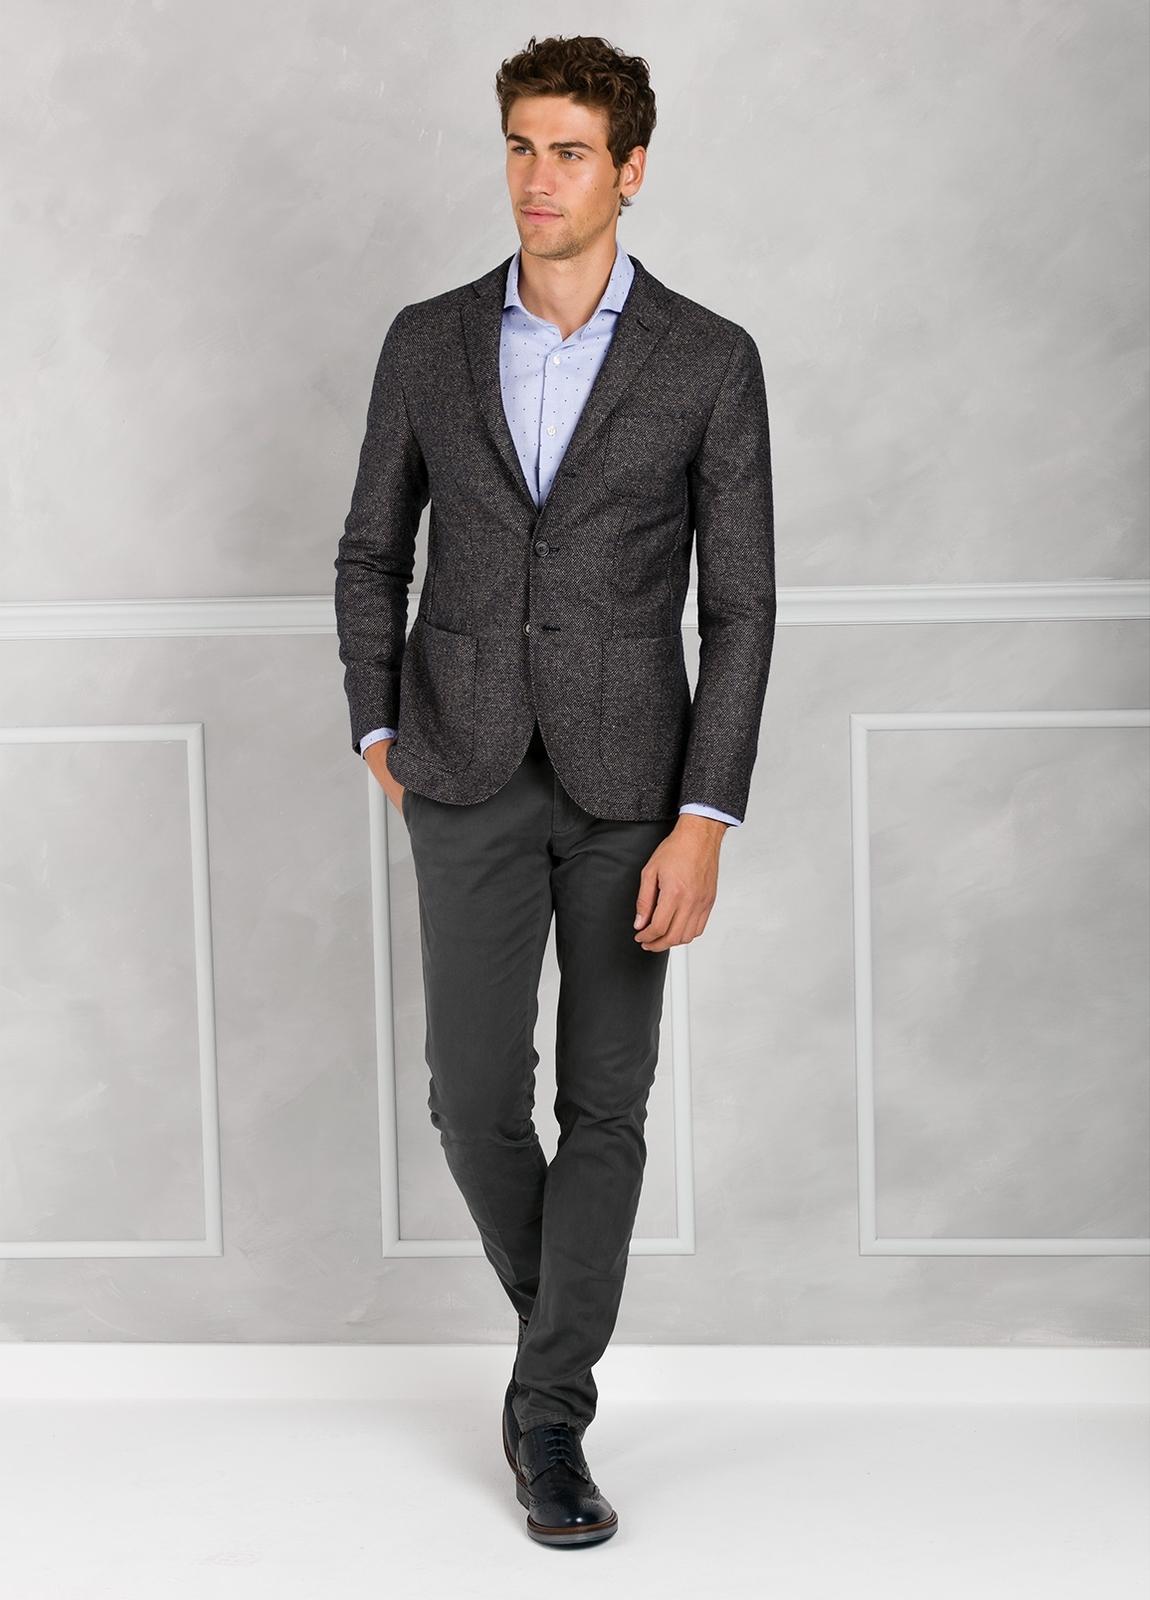 Americana textura ligeramente slim fit color gris. 75% Lana 22% Seda 3% Cashmere. - Ítem3